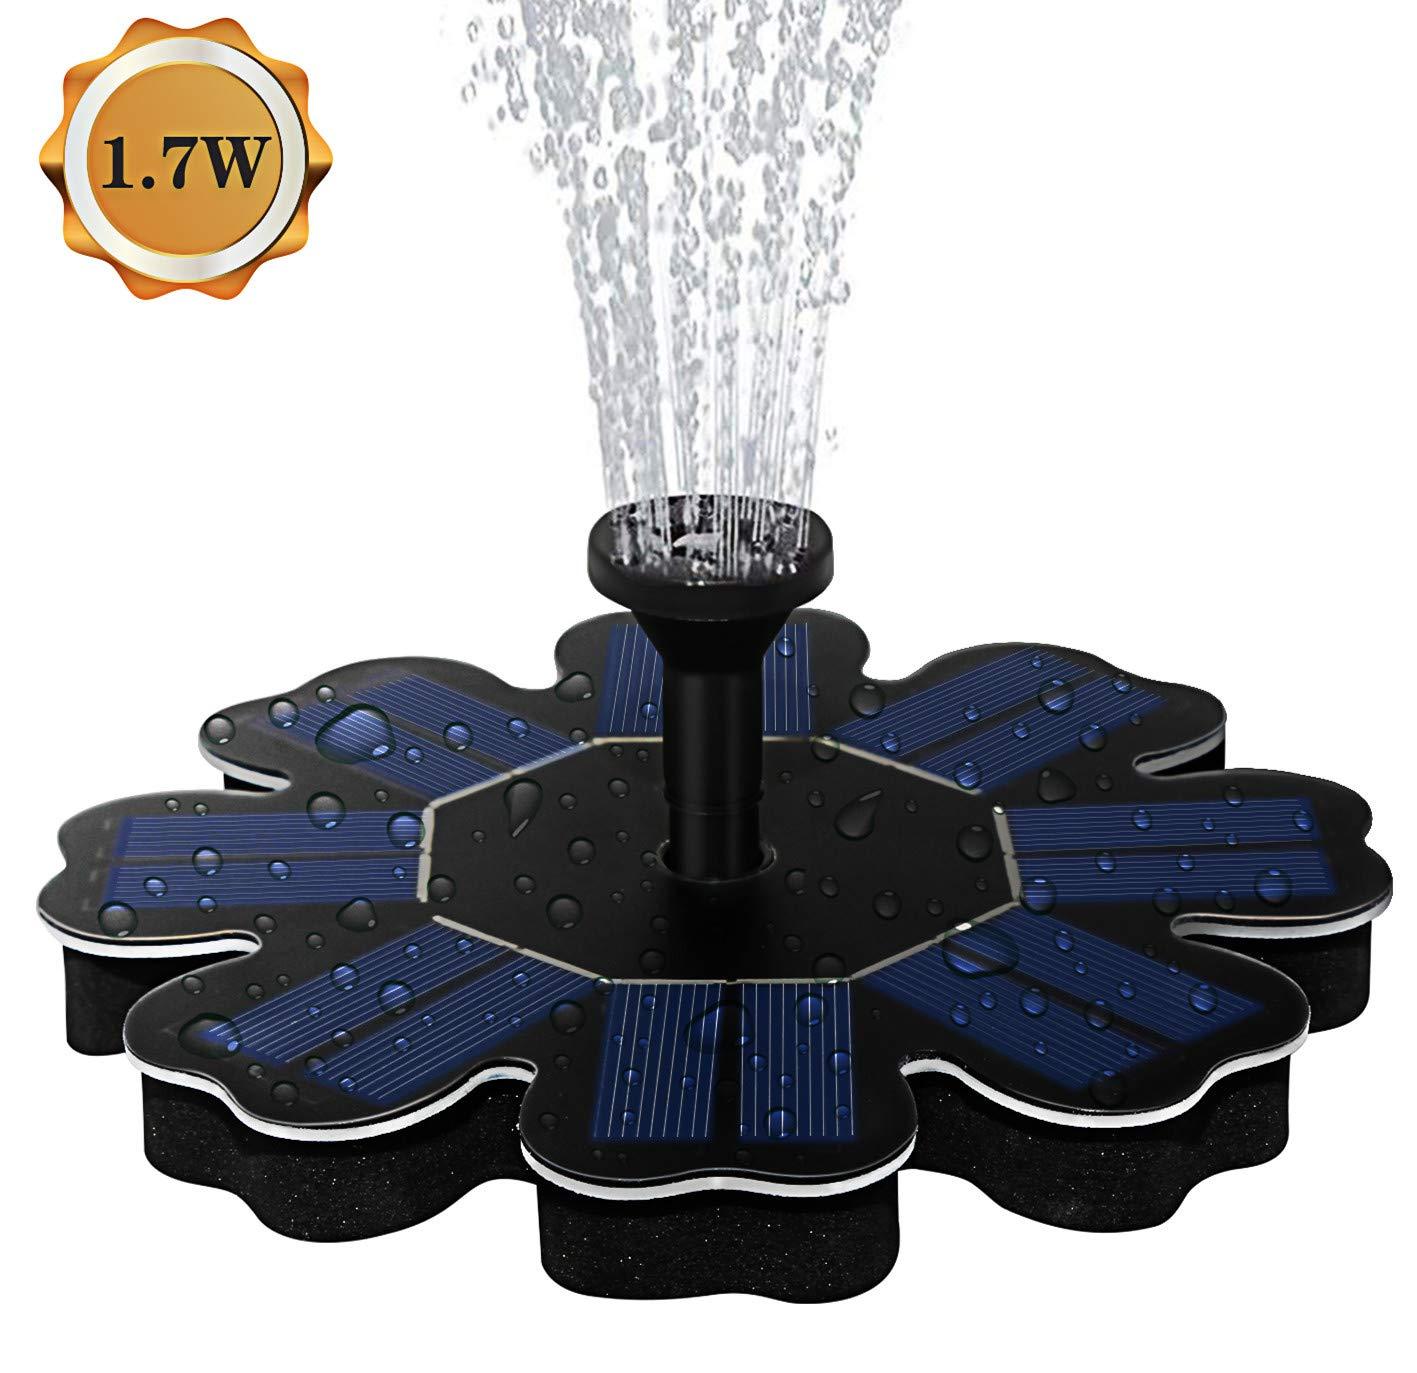 AMYER Solar Fountain, Solar birdbath Fountain, Solar Powered Fountain Pump, 1.7W Solar Panel Kit, Solar Water Fountain for Pool, Pond, Garden, Fish Tank, Aquarium by AMYER